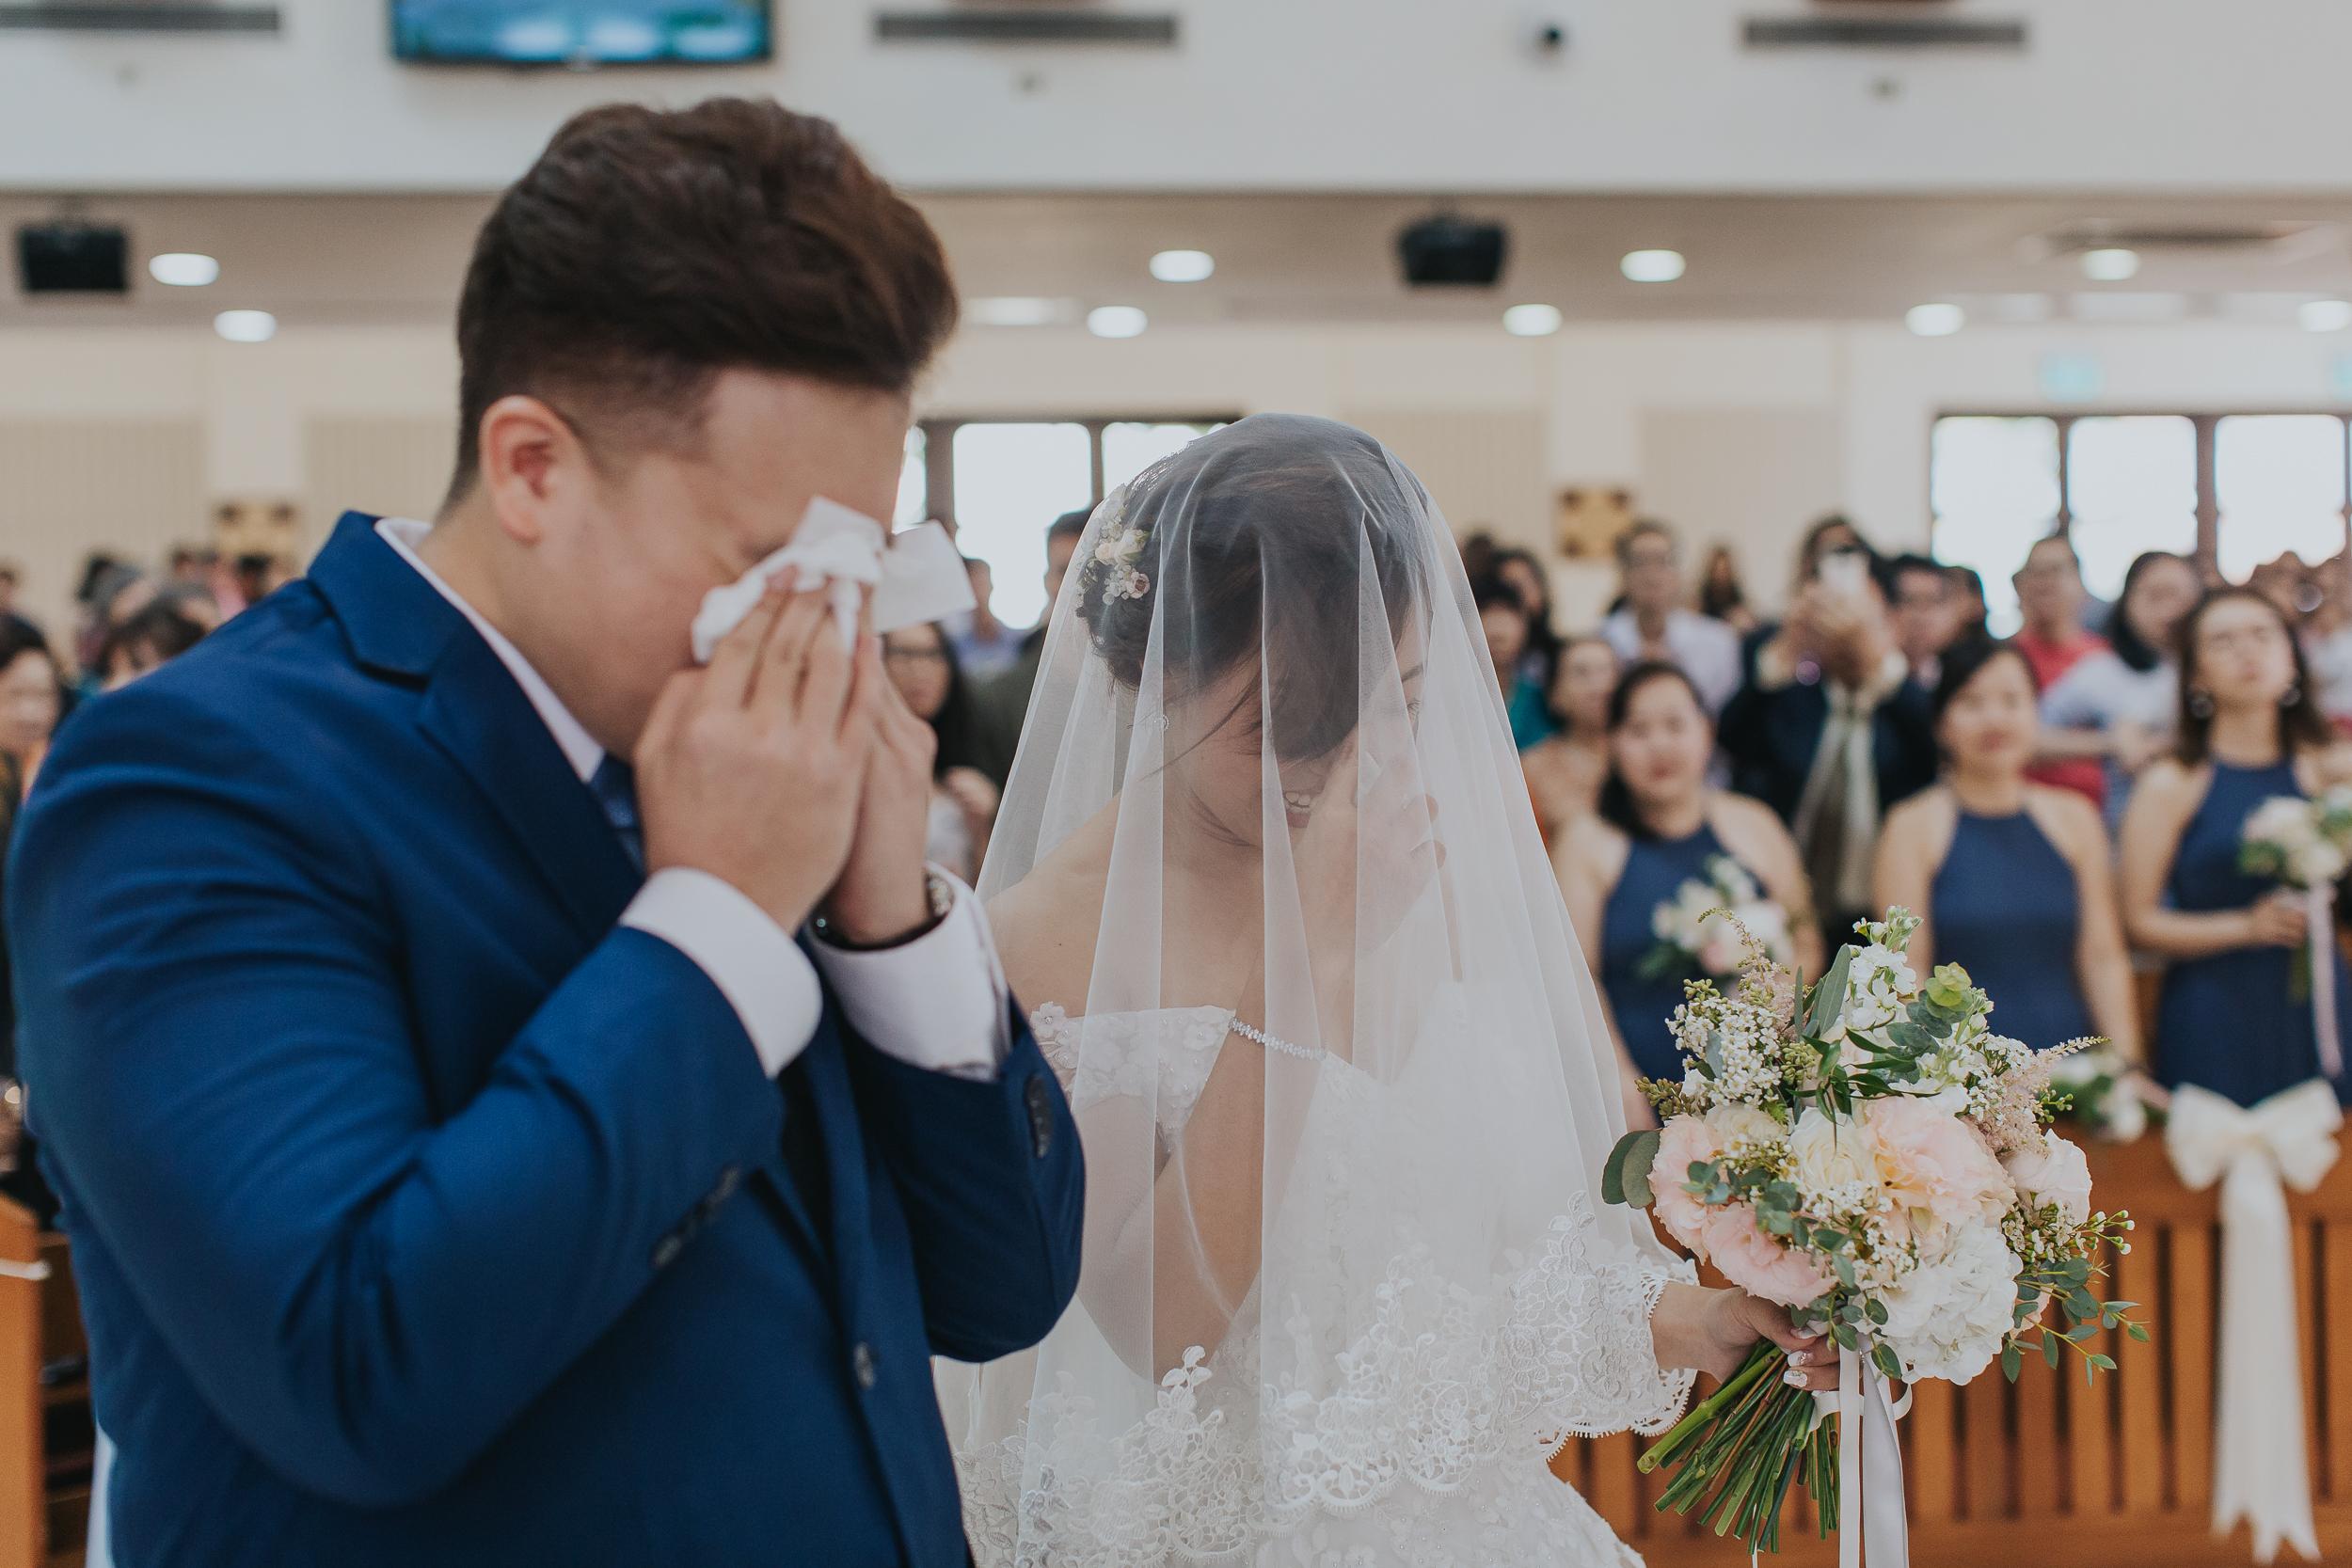 Singapore+Actual+Day+Wedding+Photographer+Grand+Mercure+Oliver+Estelle-0049.jpg